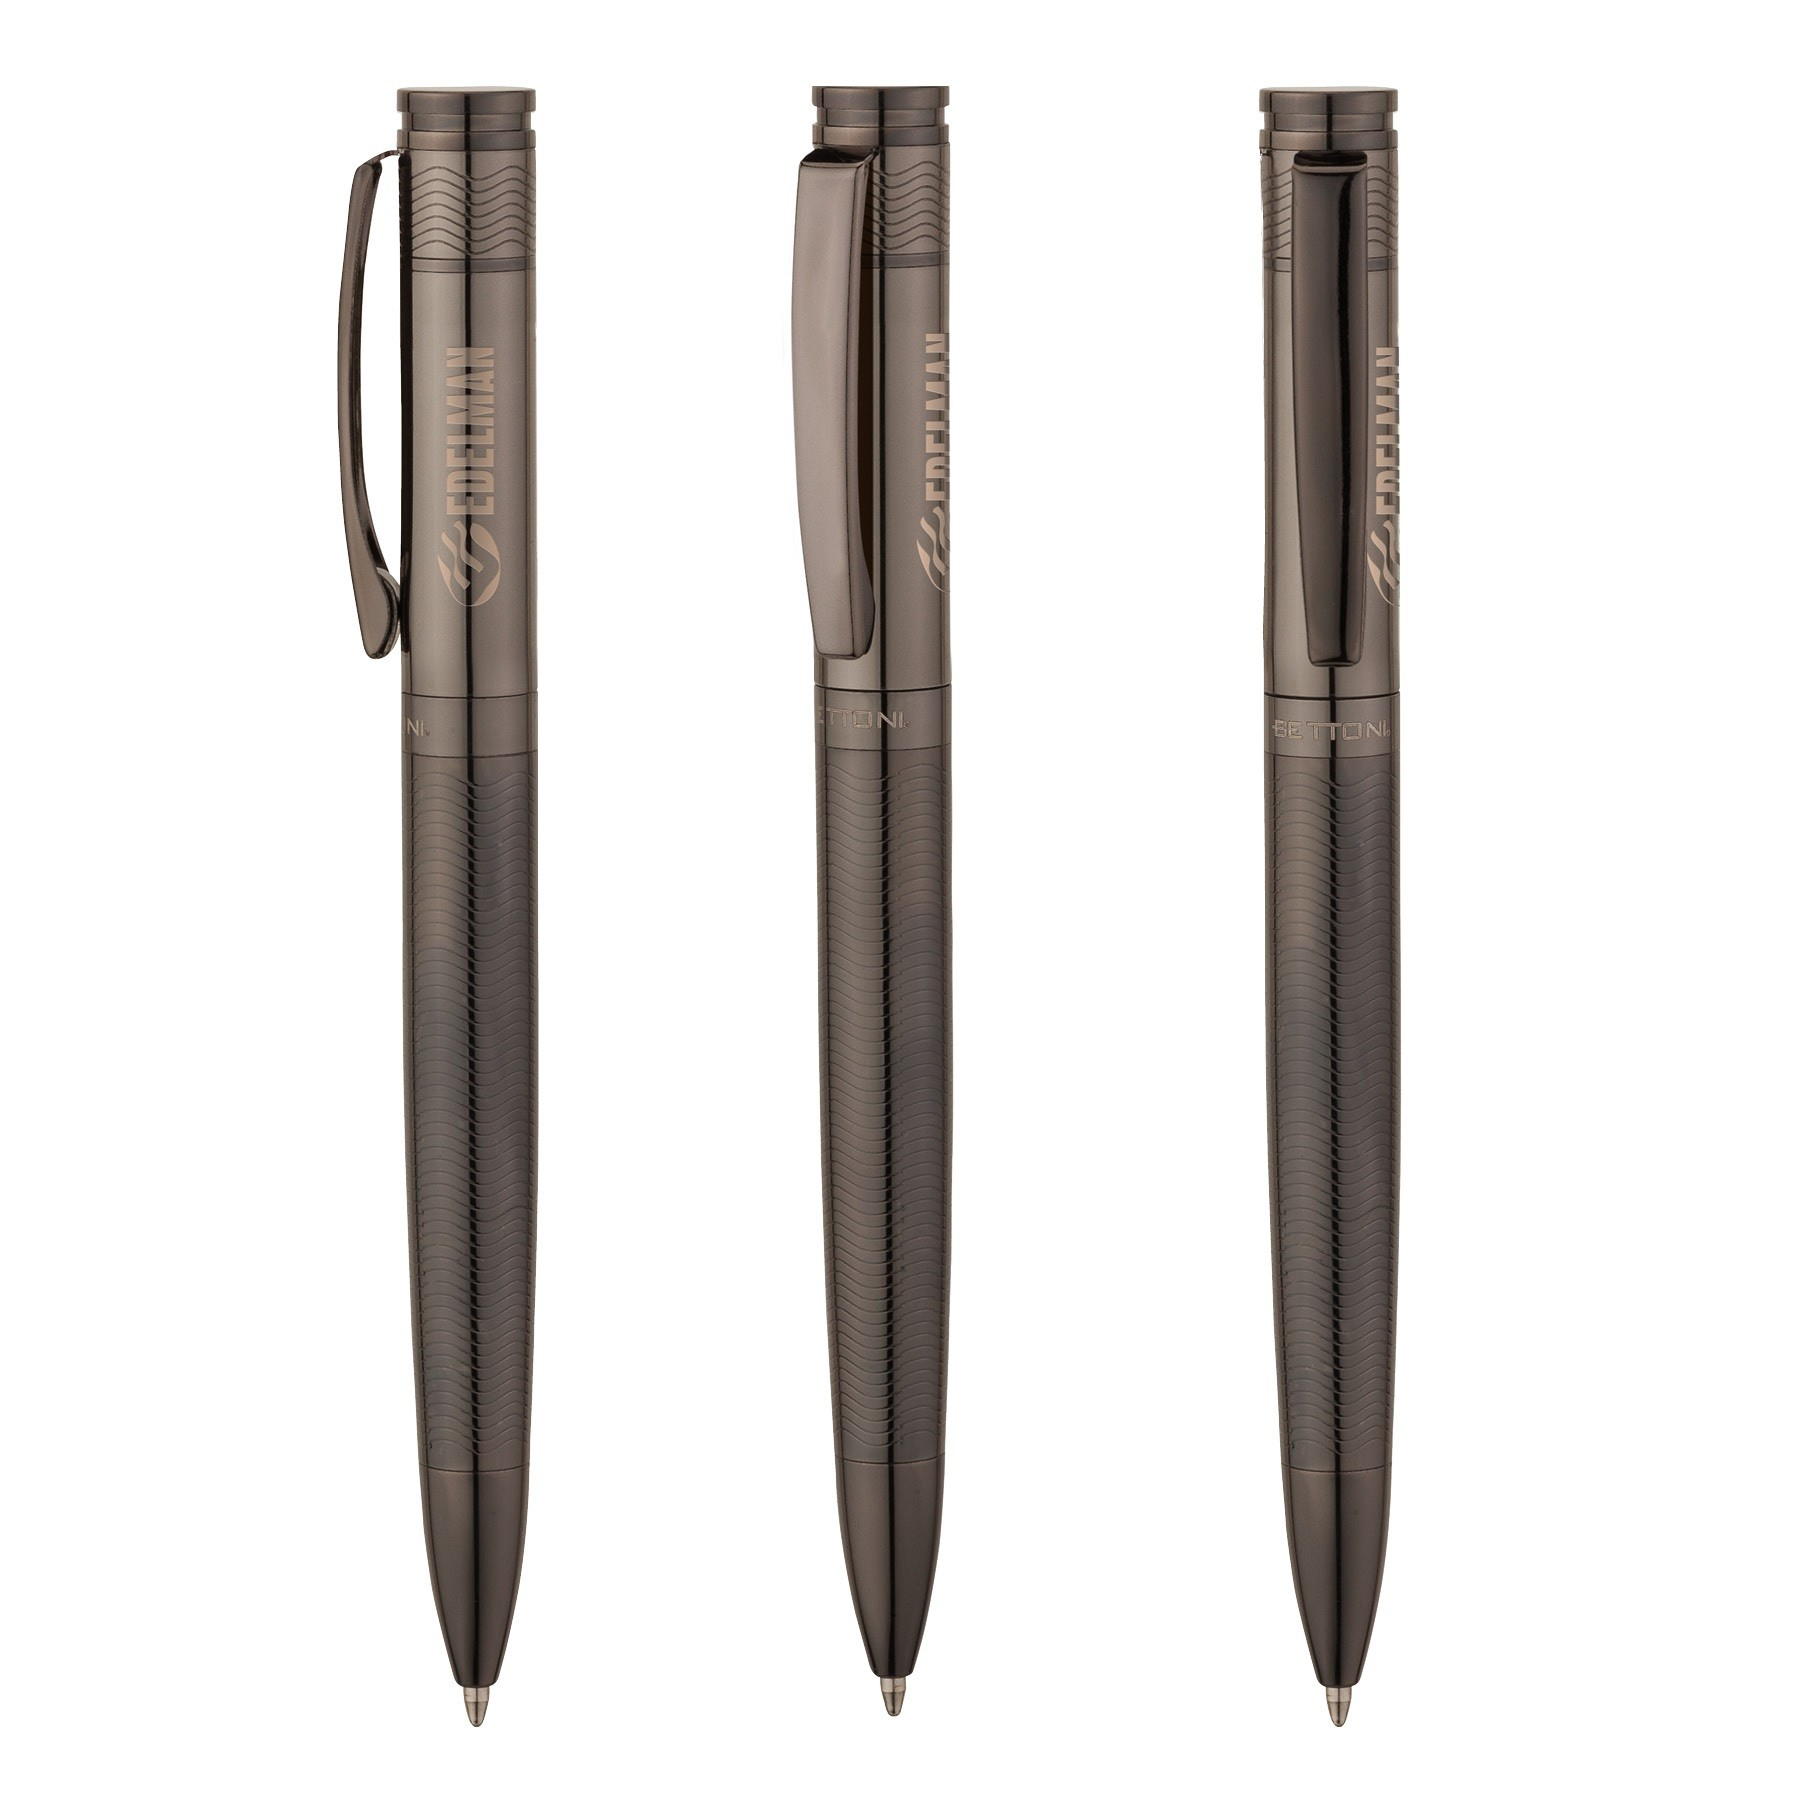 Bettoni® Abbracci Ballpoint Pen